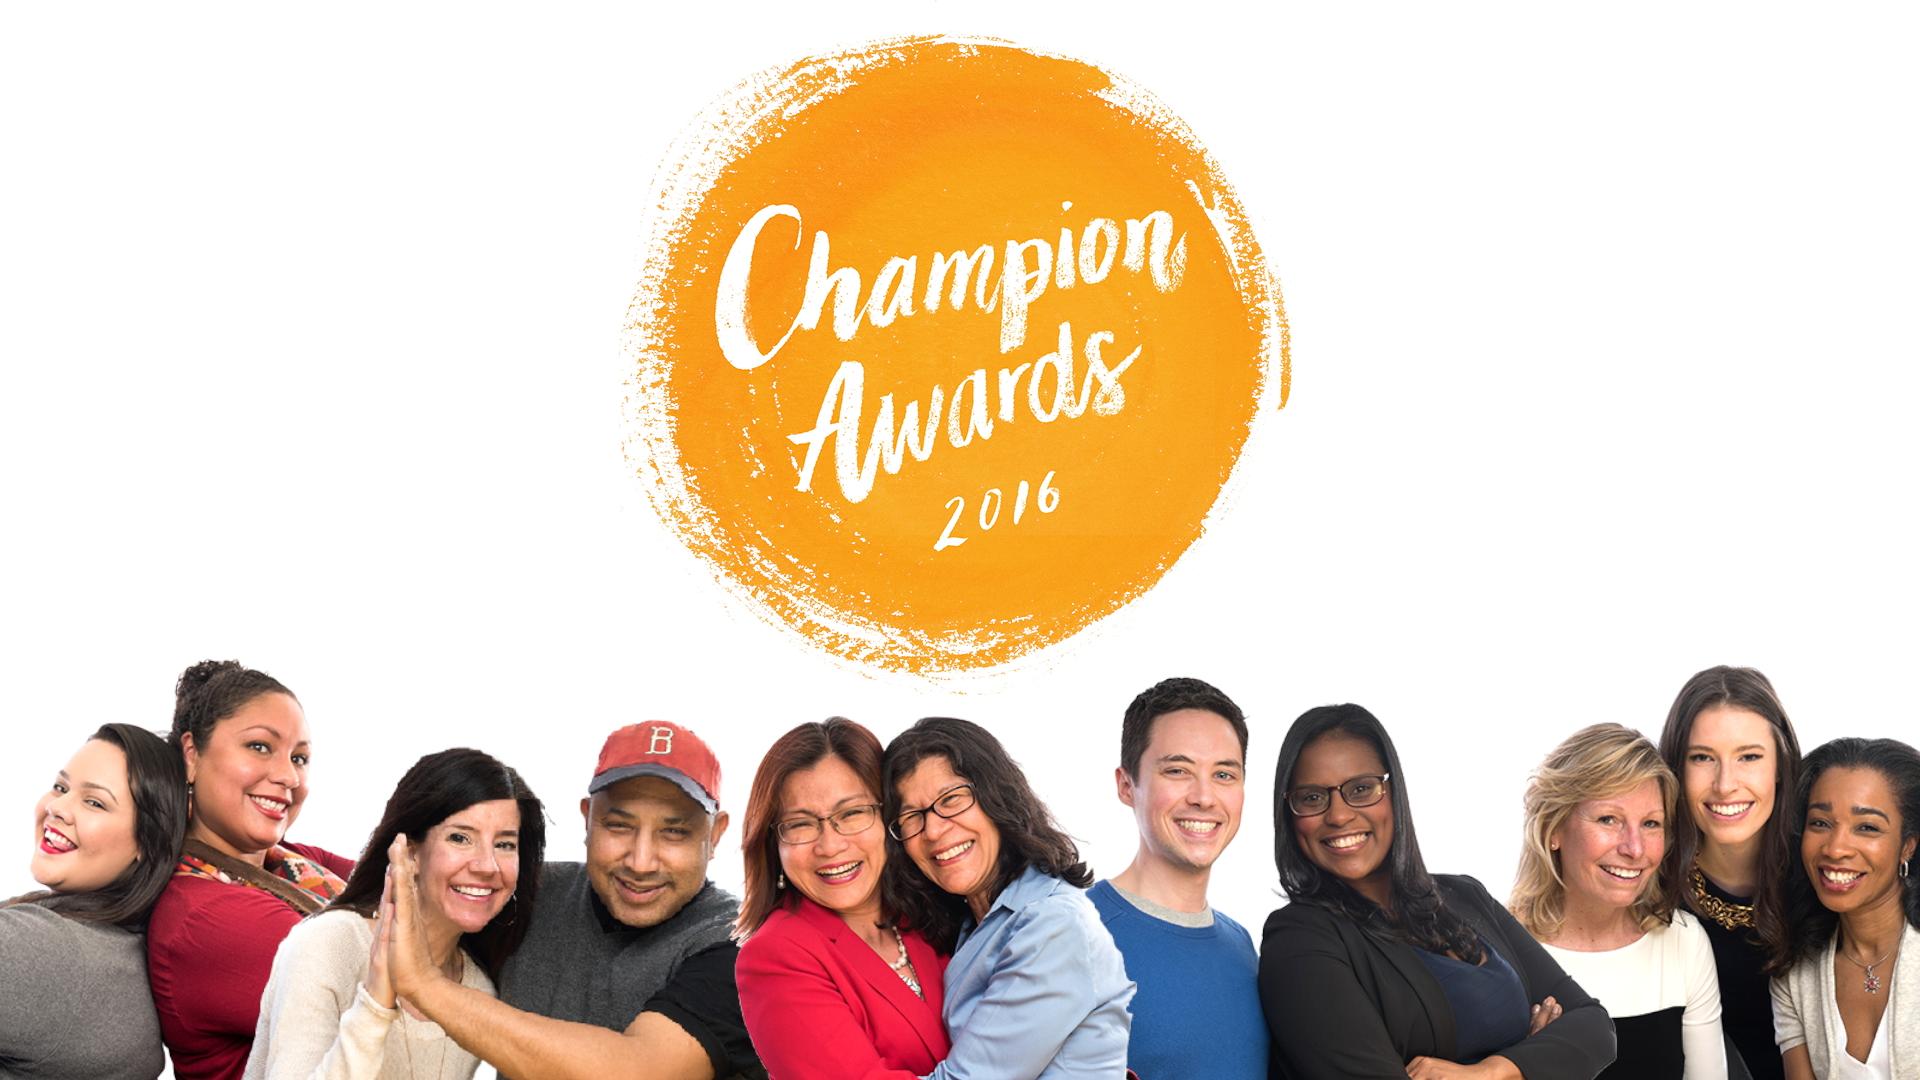 Safe Horizon's 21st Annual Champion Awards 2016